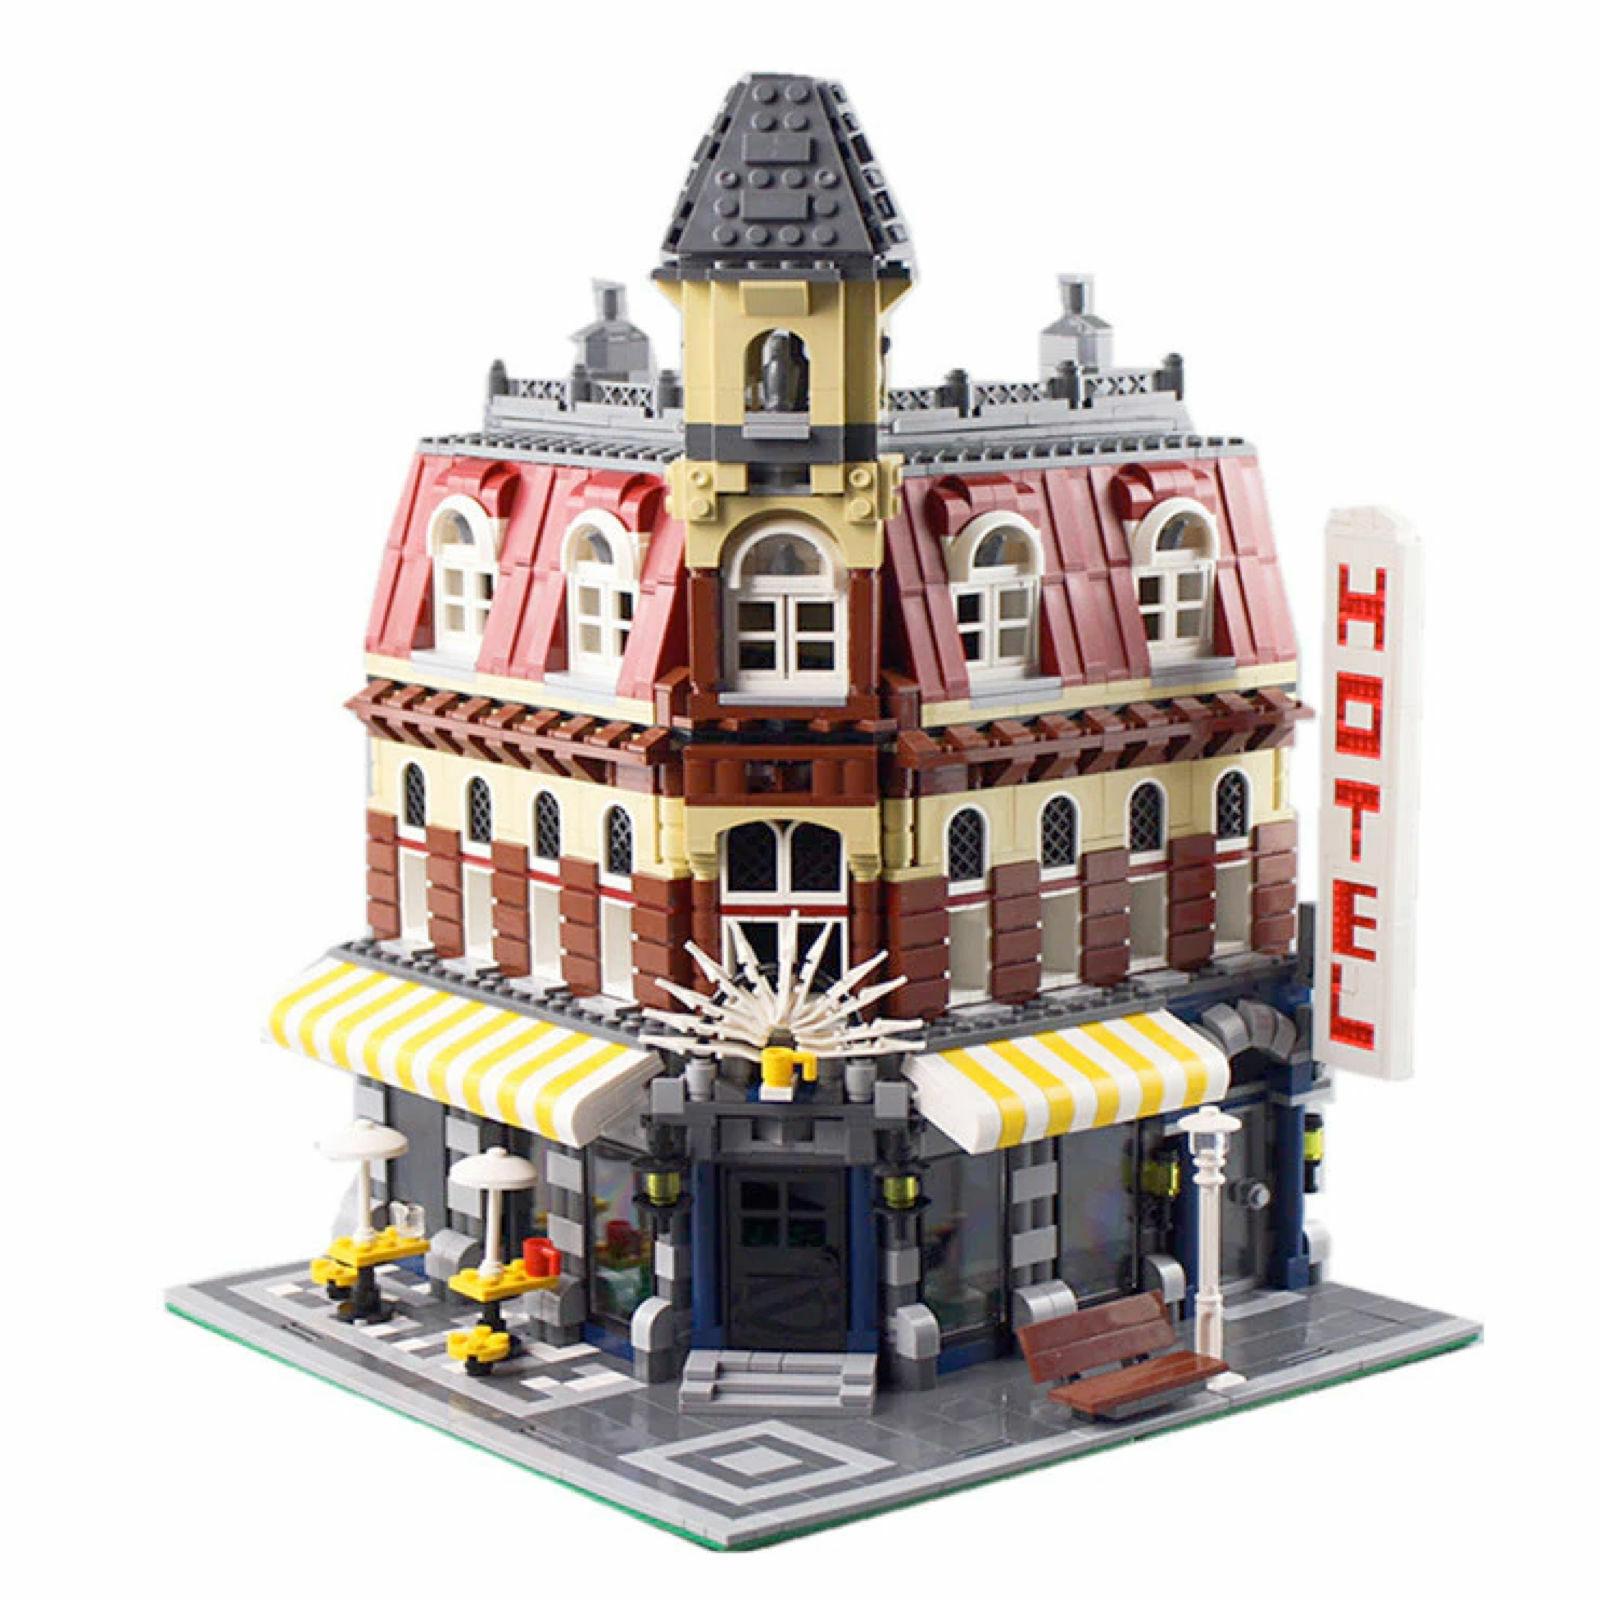 LEGO COMPATIBILE Technic 10182 Cafe Corner - set City Creator New Creator 2133Pc